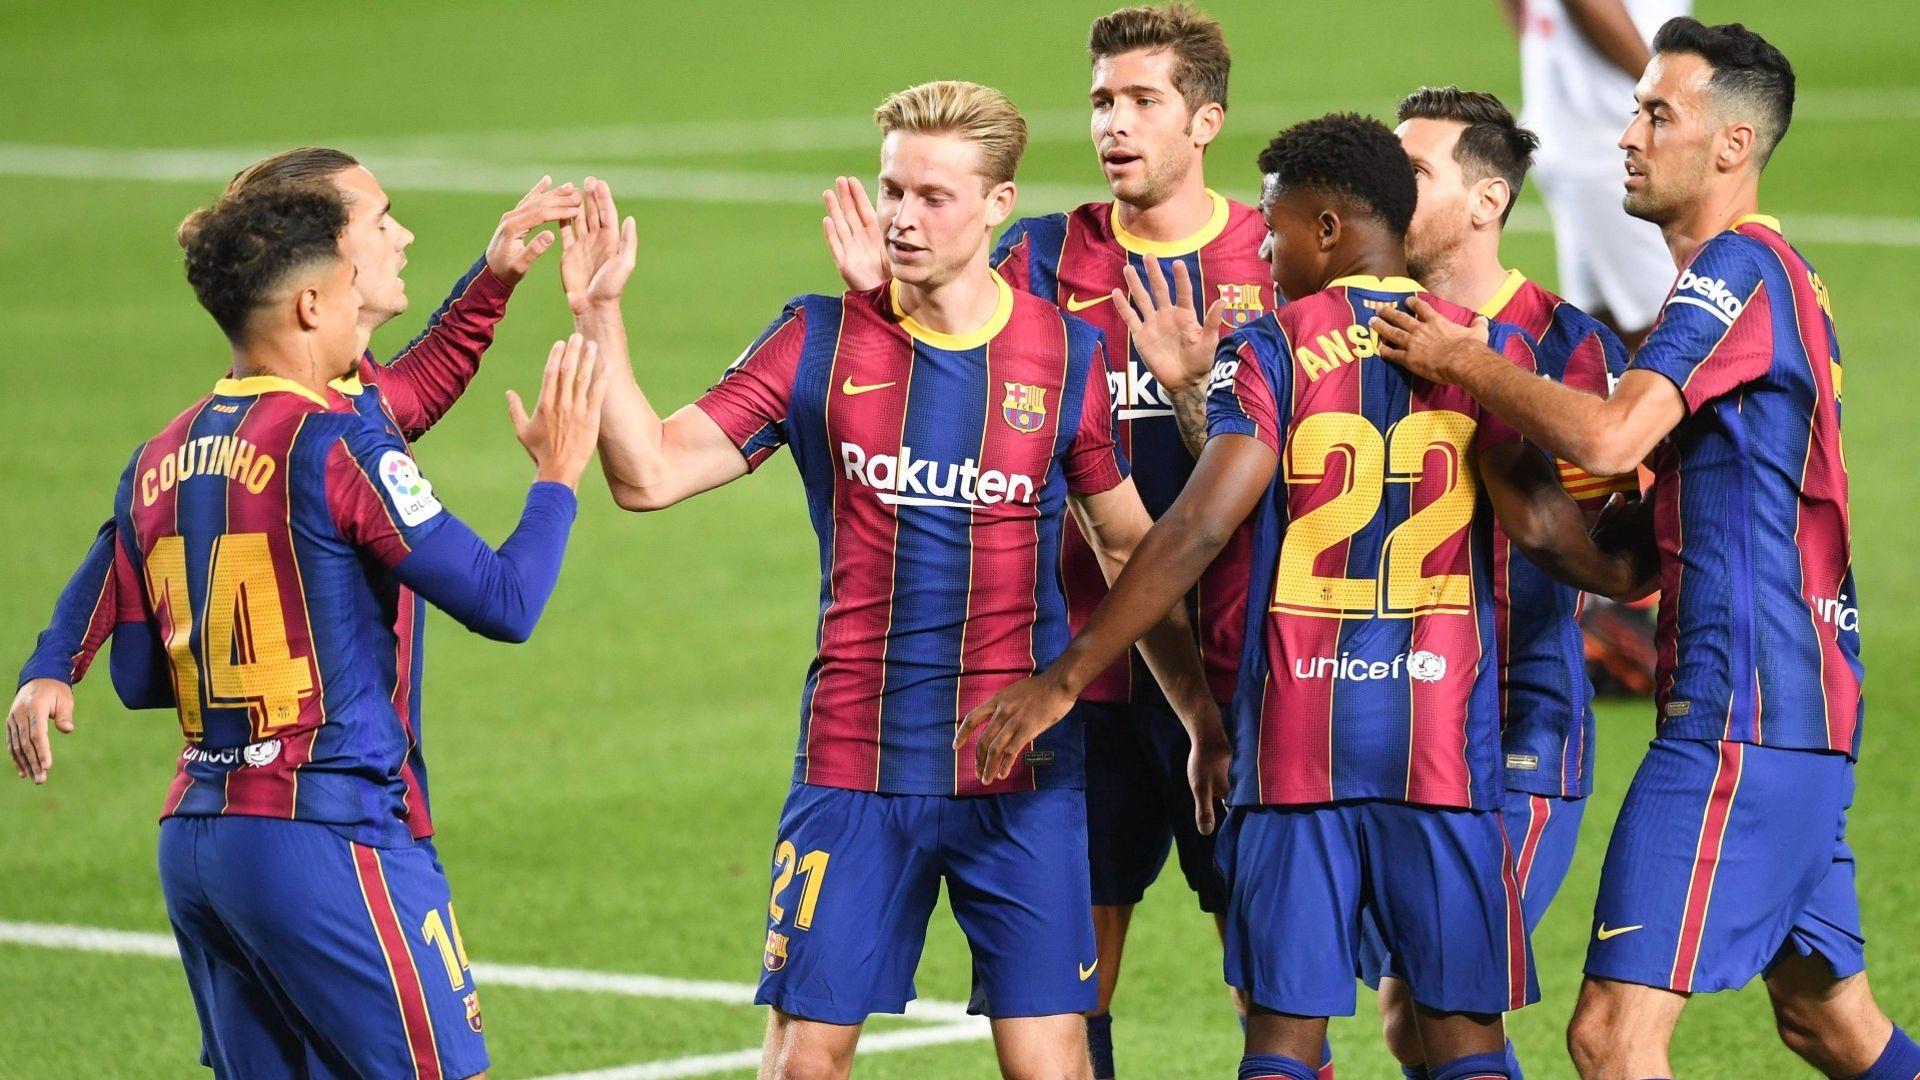 HttpContext.Current.Server.HtmlEncode(FC Barcelona - Real Madryt)